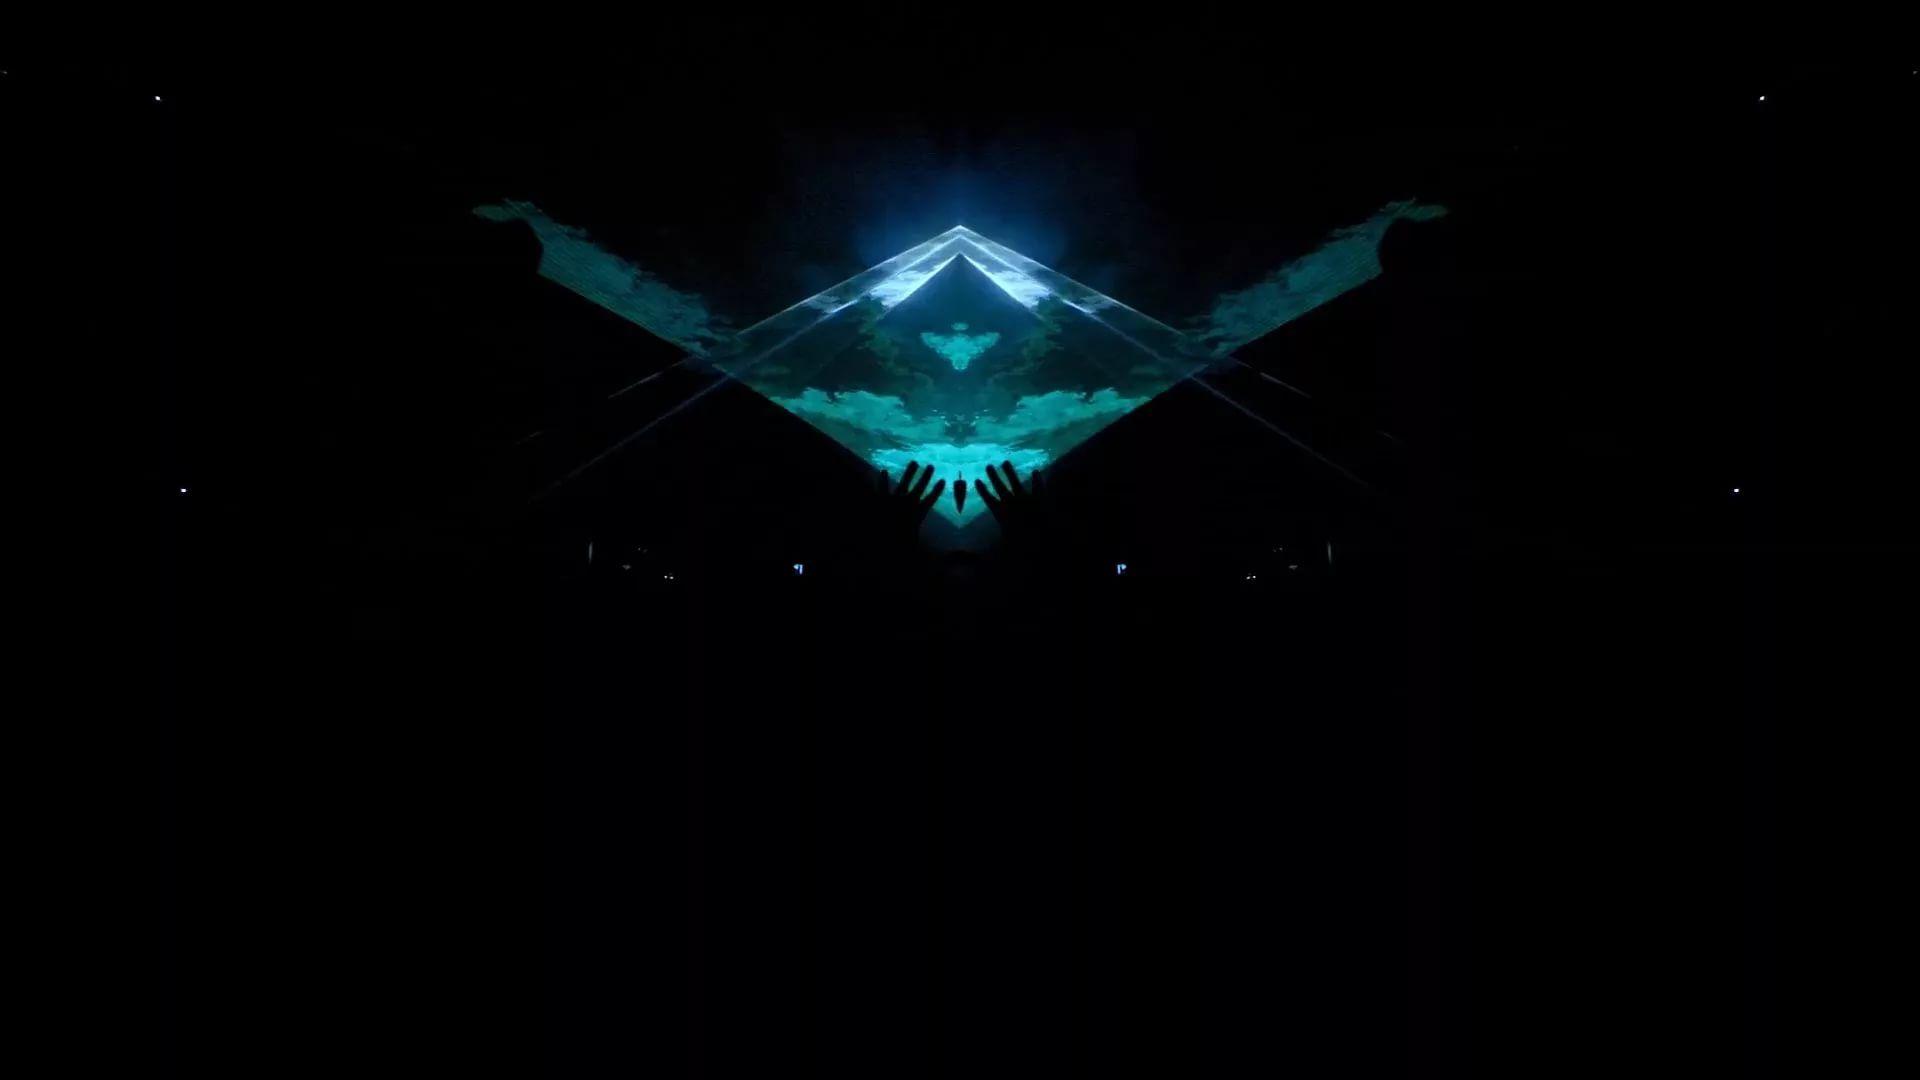 Freemason Free Download Wallpaper